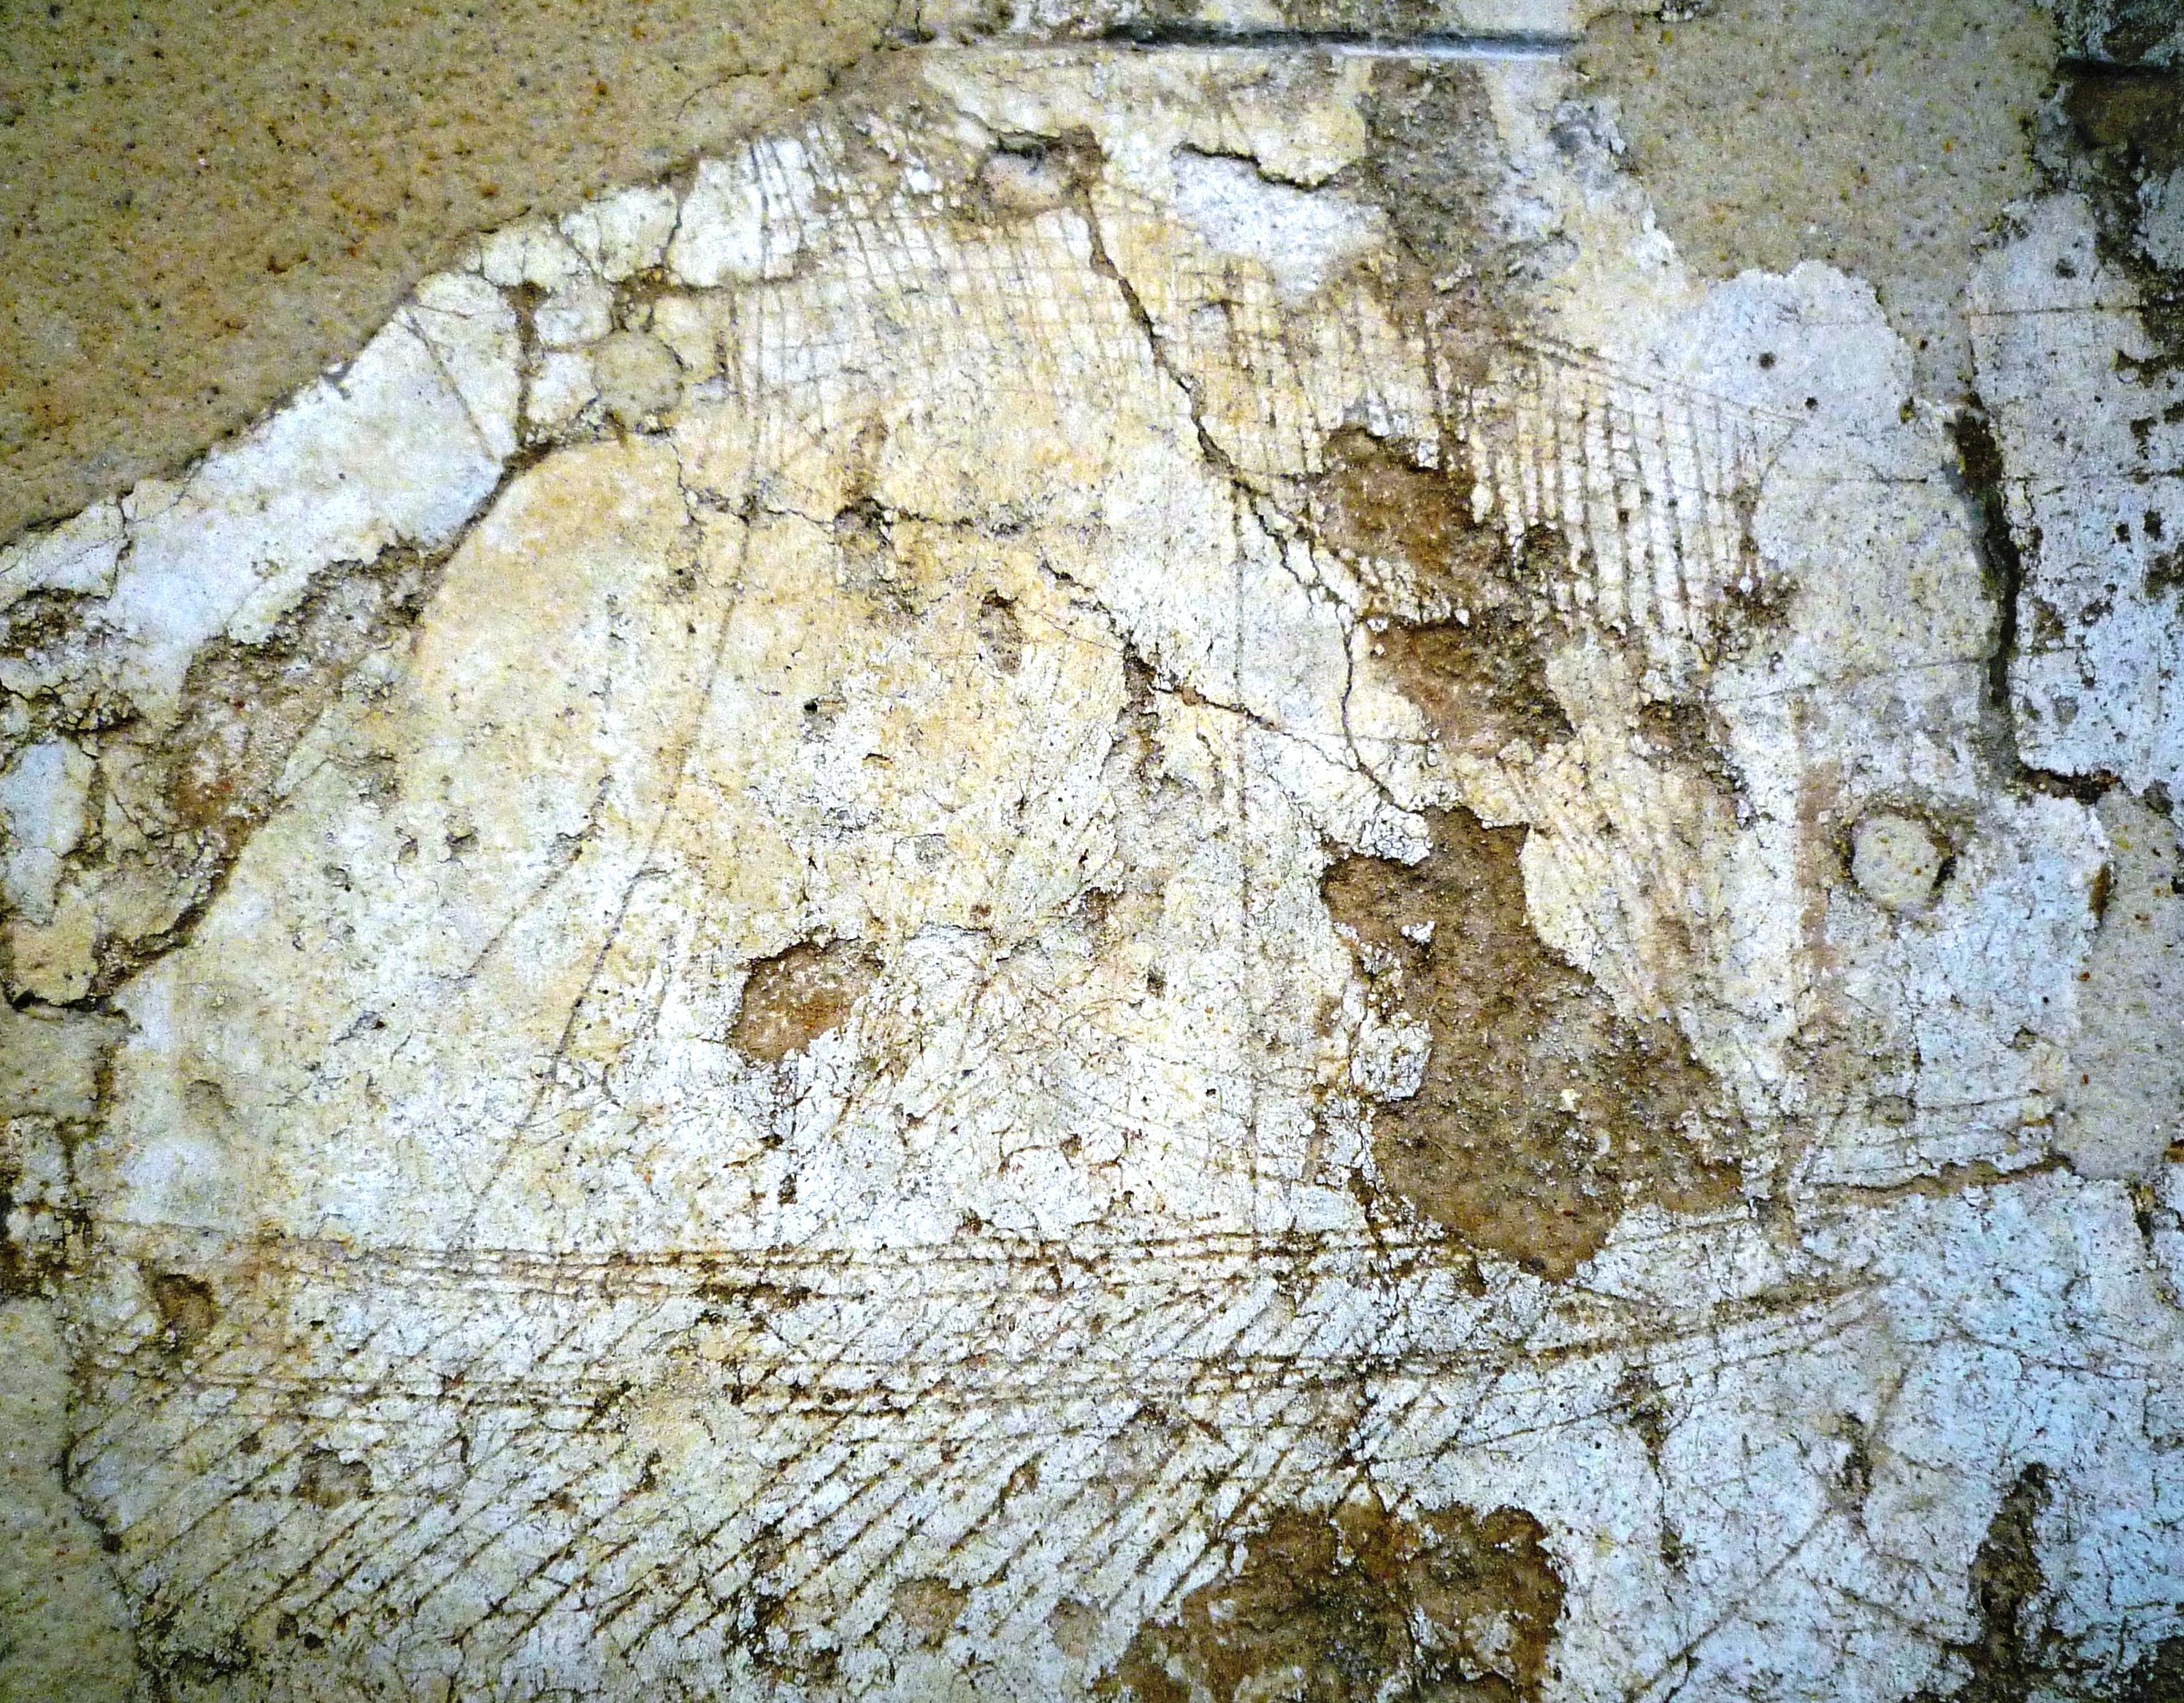 http://www.ancientportsantiques.com/wp-content/uploads/2011/07/Delos-Graffito28oars.jpg